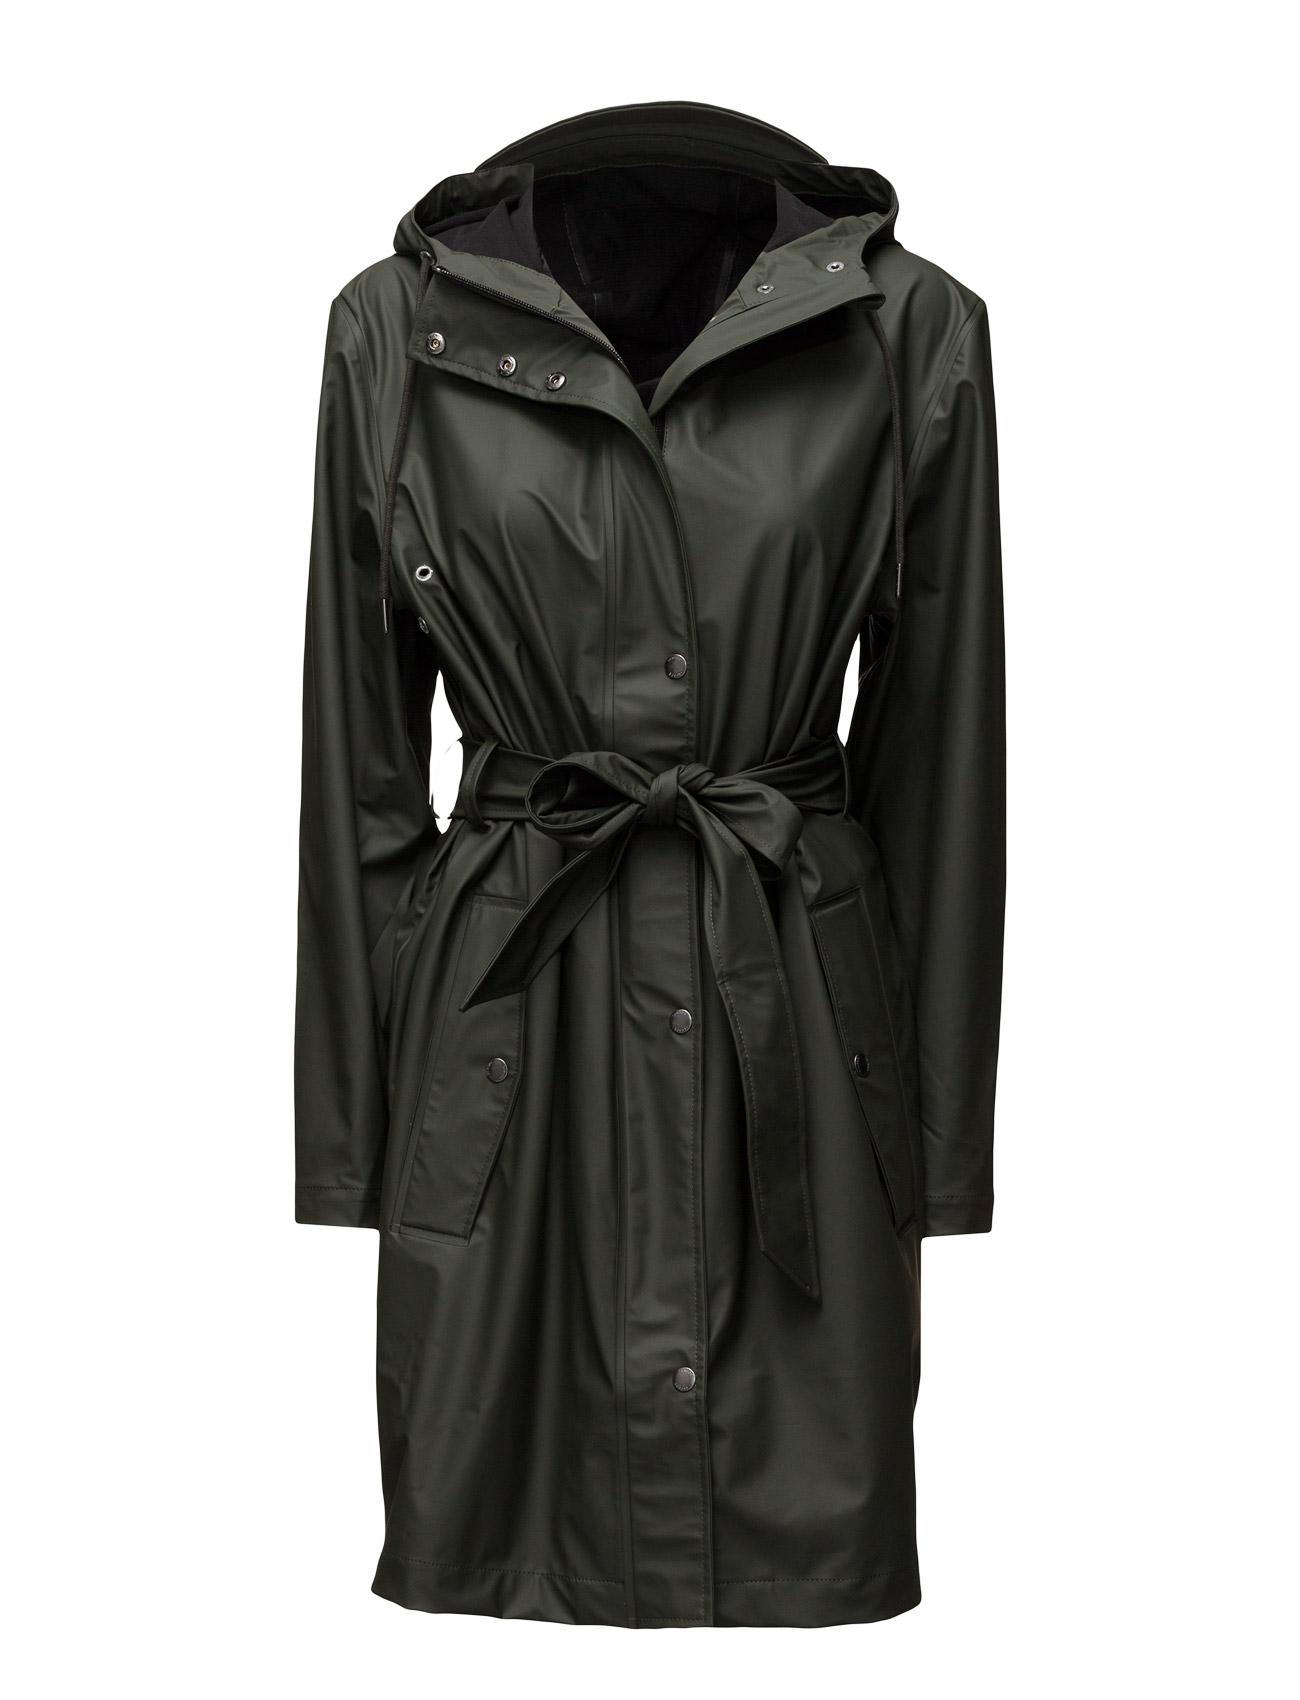 Haze Jacket 7357 Samsøe & Samsøe Regntøj til Kvinder i